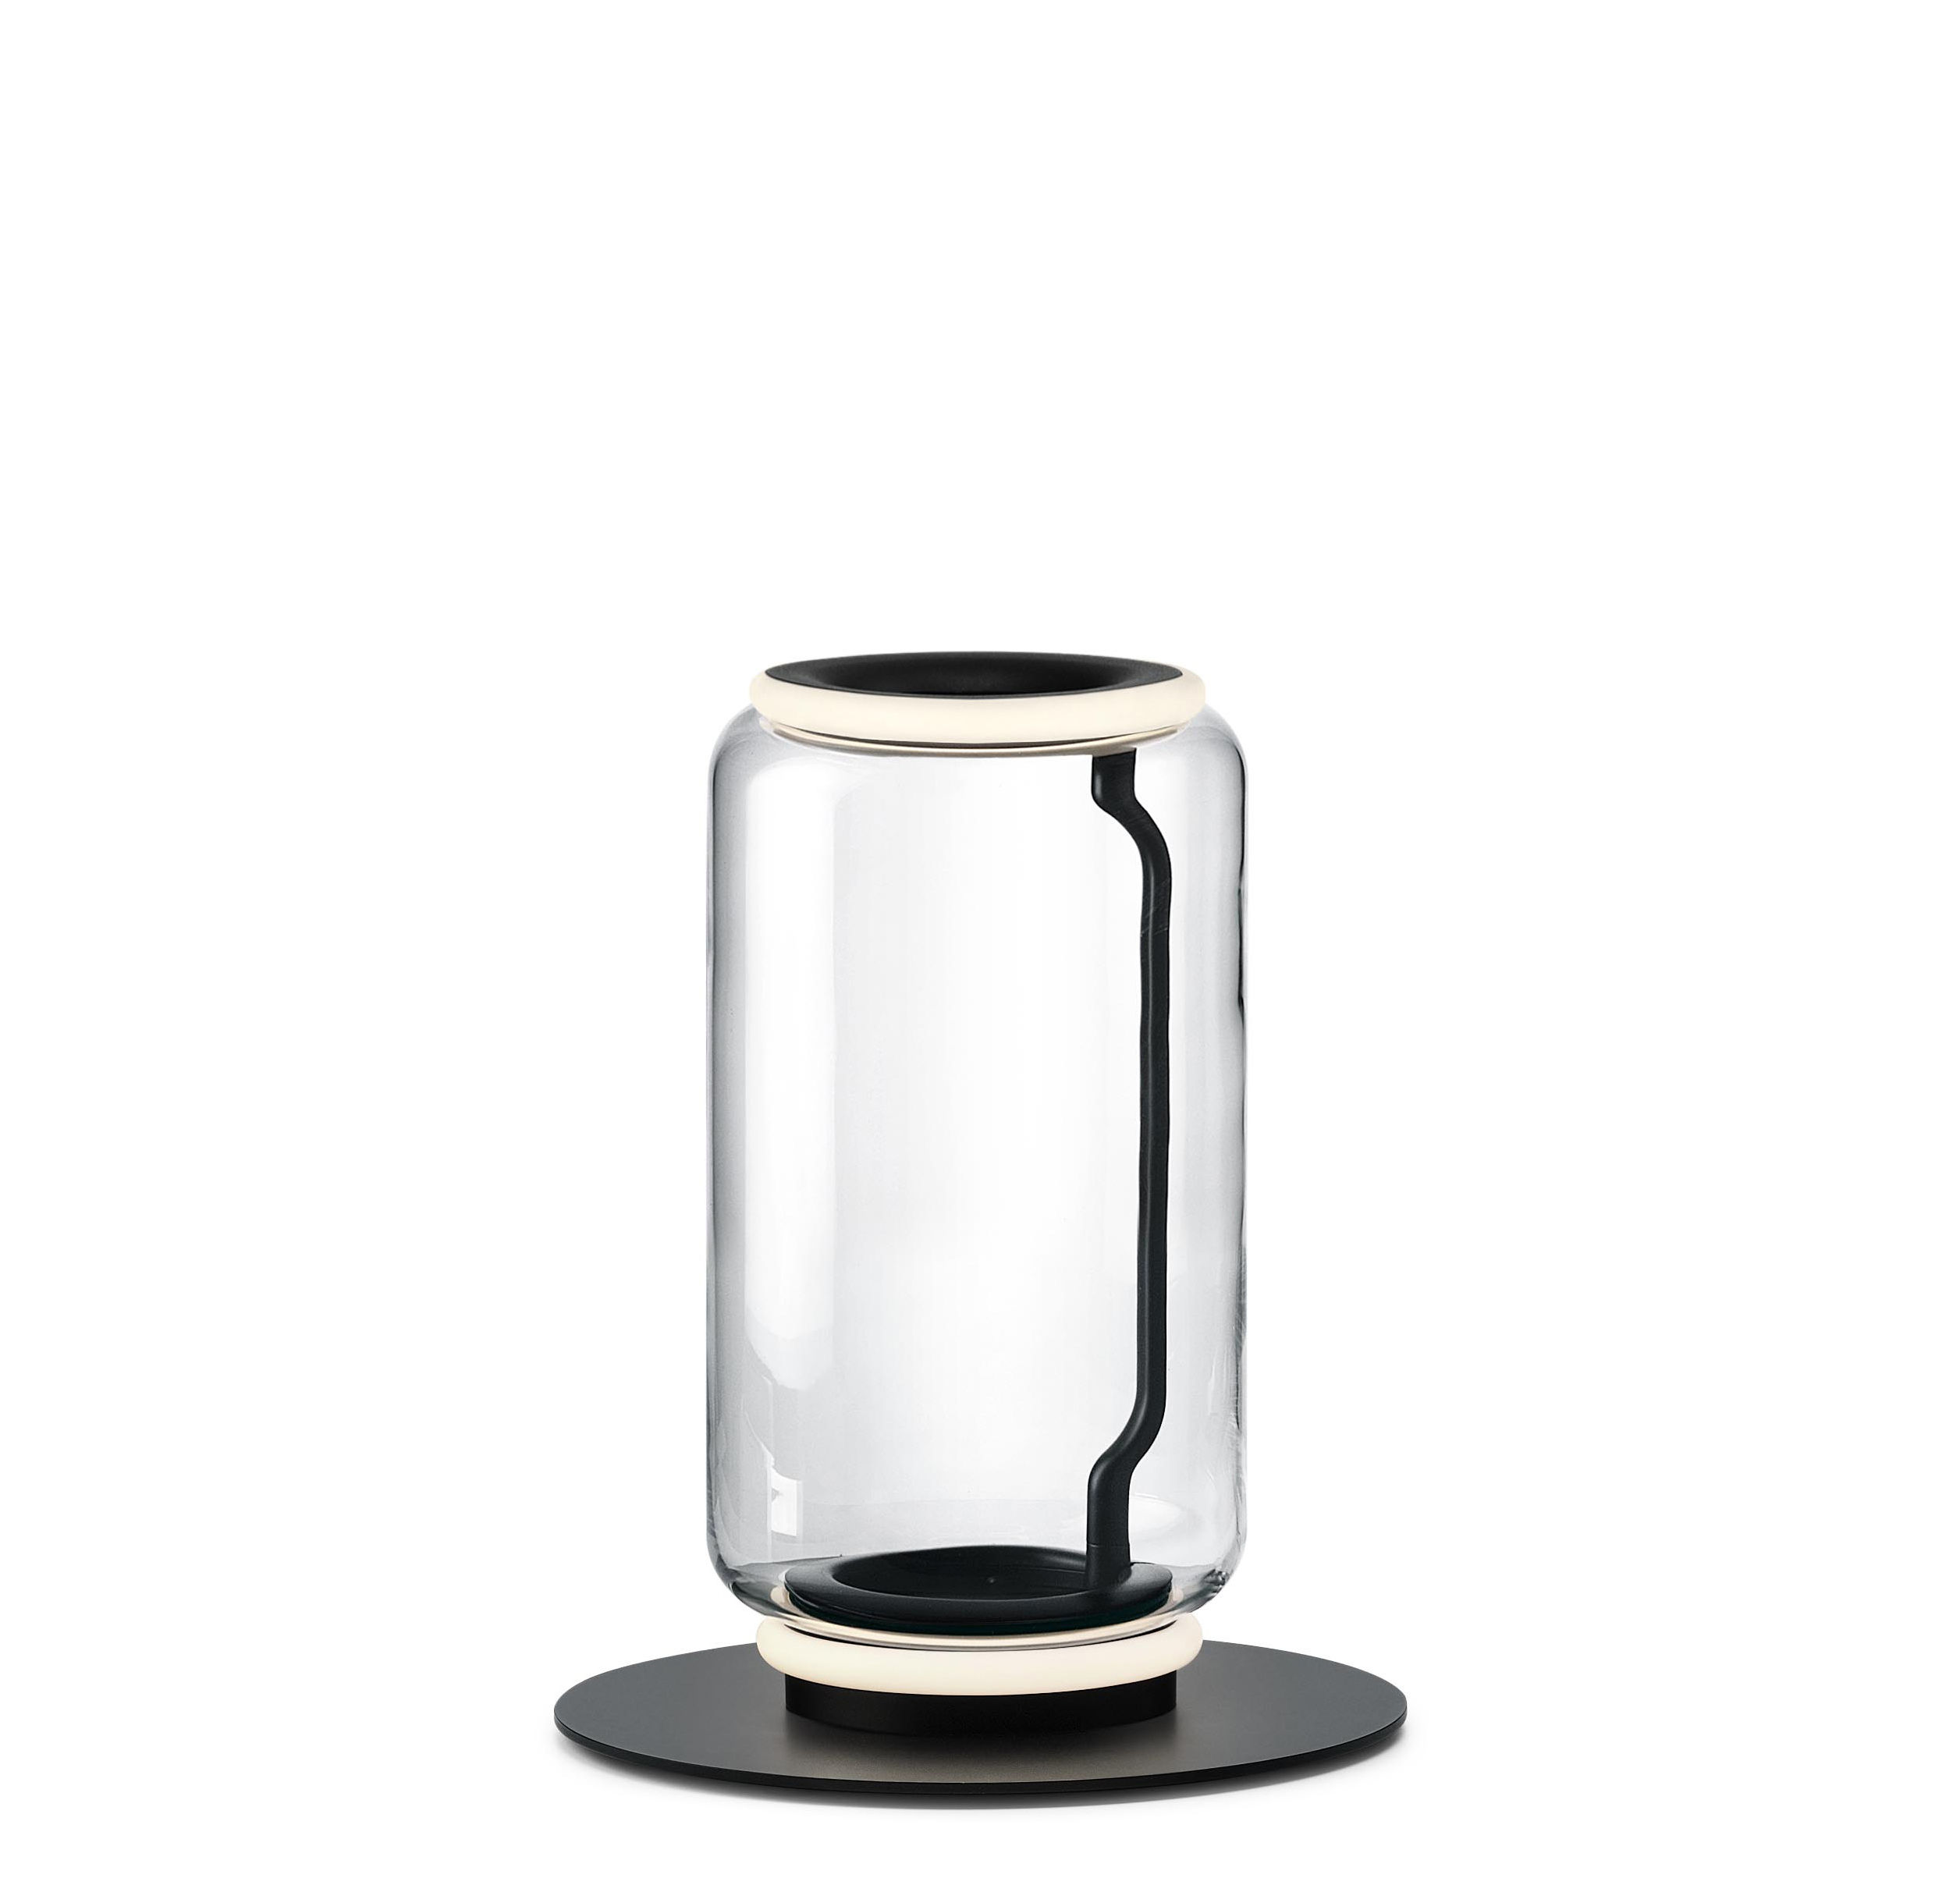 Leuchten - Stehleuchten - Noctambule Cylindre n°1 Bodenleuchte / LED - Ø 25 x H 50 cm - Flos - H 50 cm / Transparent - geblasenes Glas, Gussaluminium, Stahl